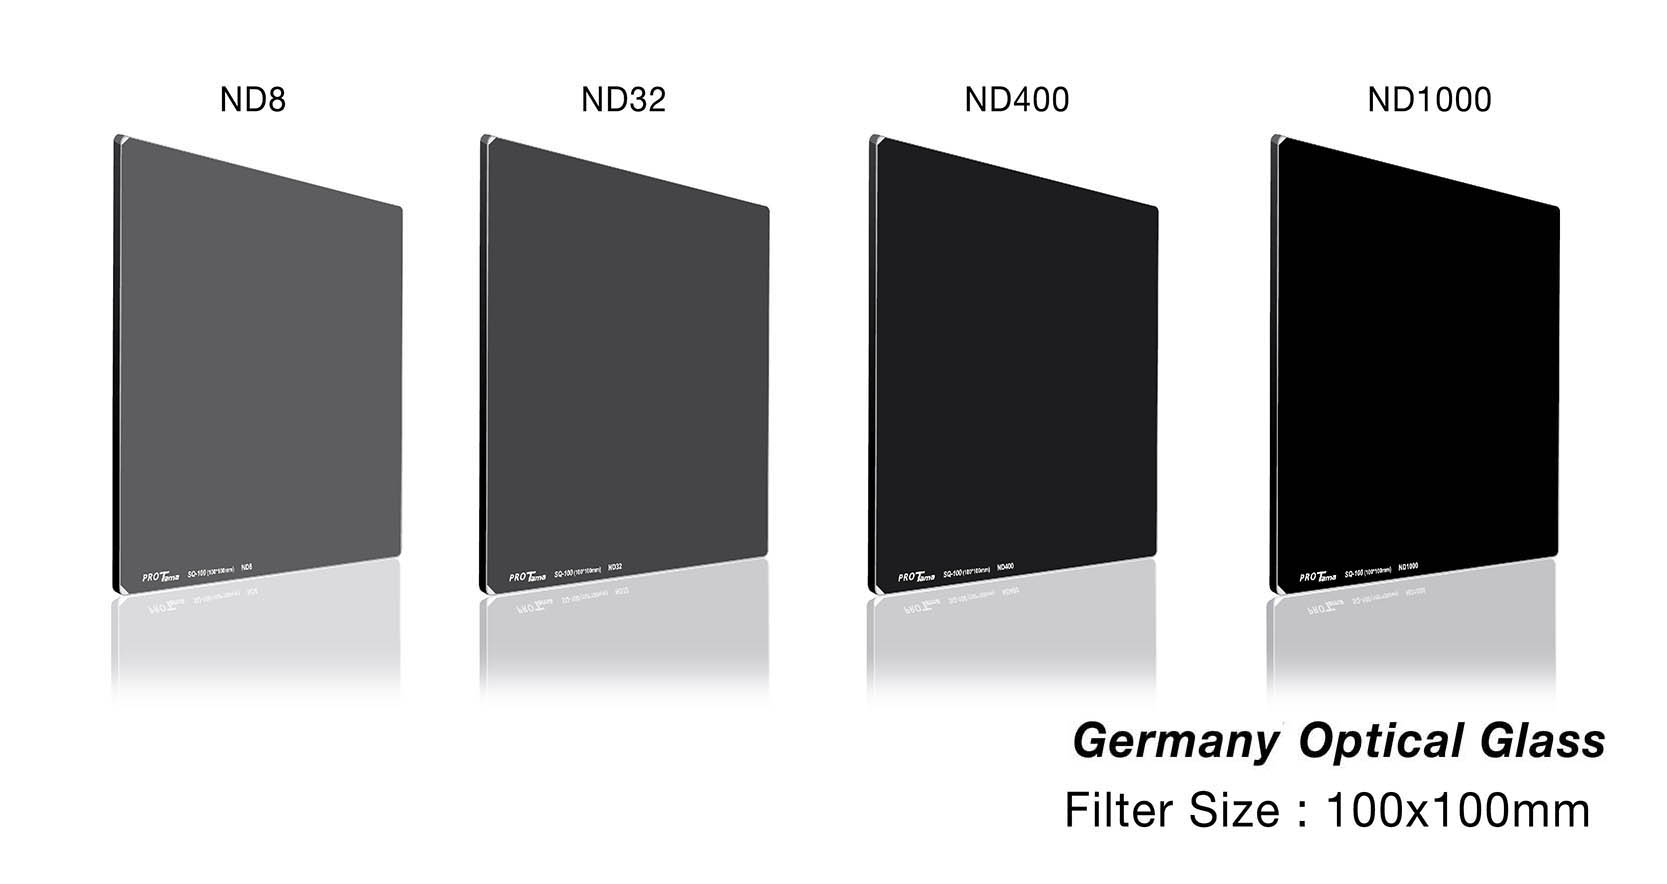 ProTama 天馬 (SQ-100) HD 高清方形濾鏡 100x100 (ND8, ND16, ND8) - 德國光學玻璃材料